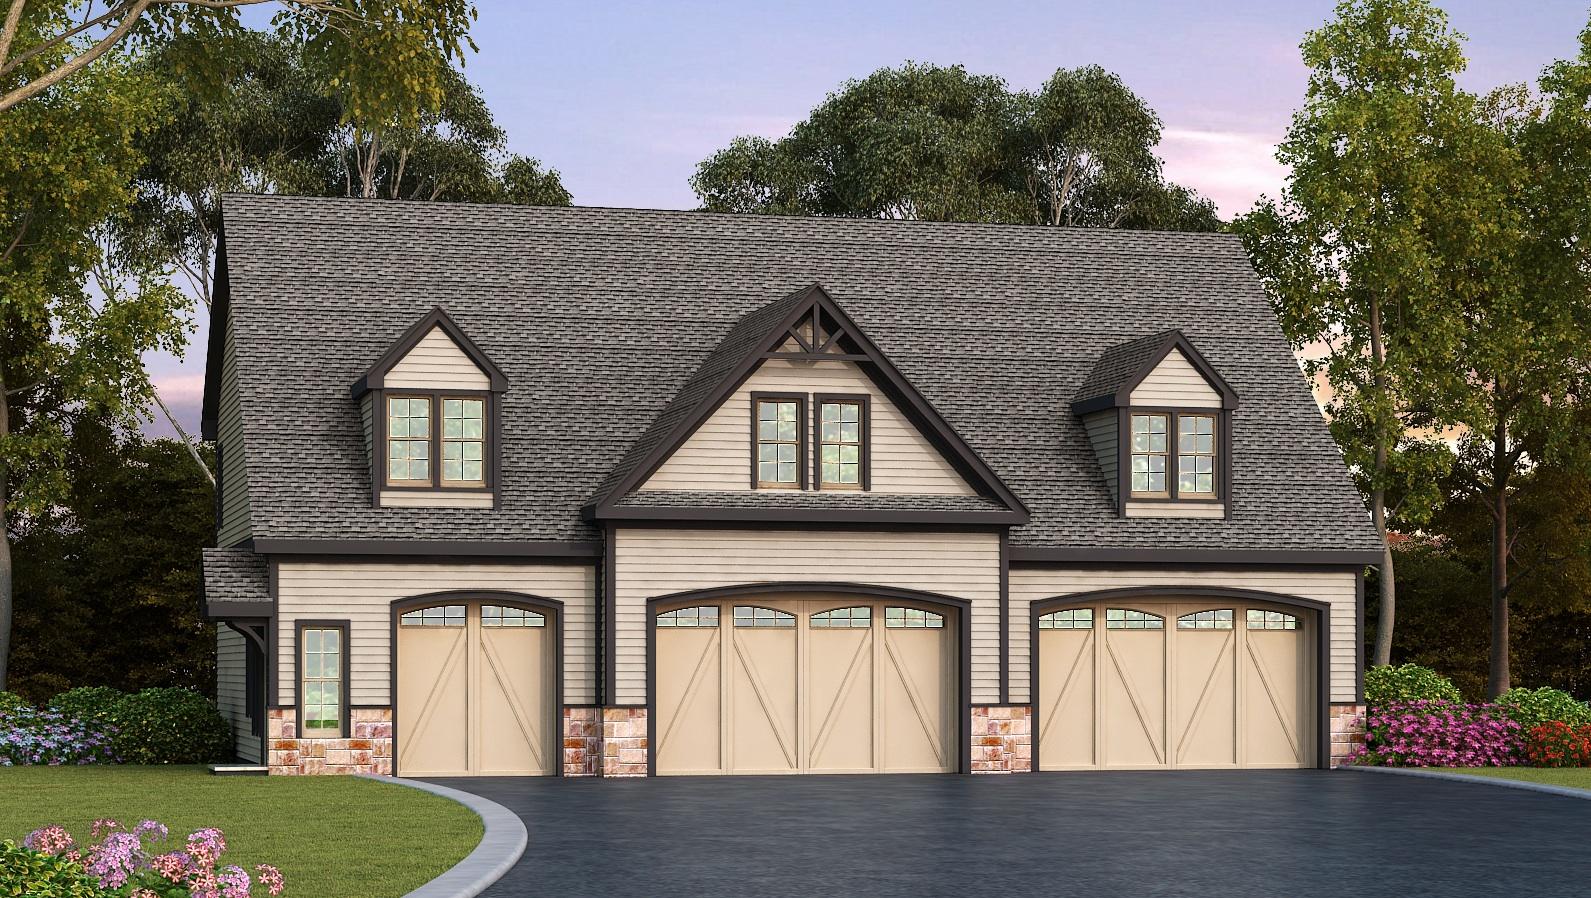 3 Car Garage Plans with RV Bay